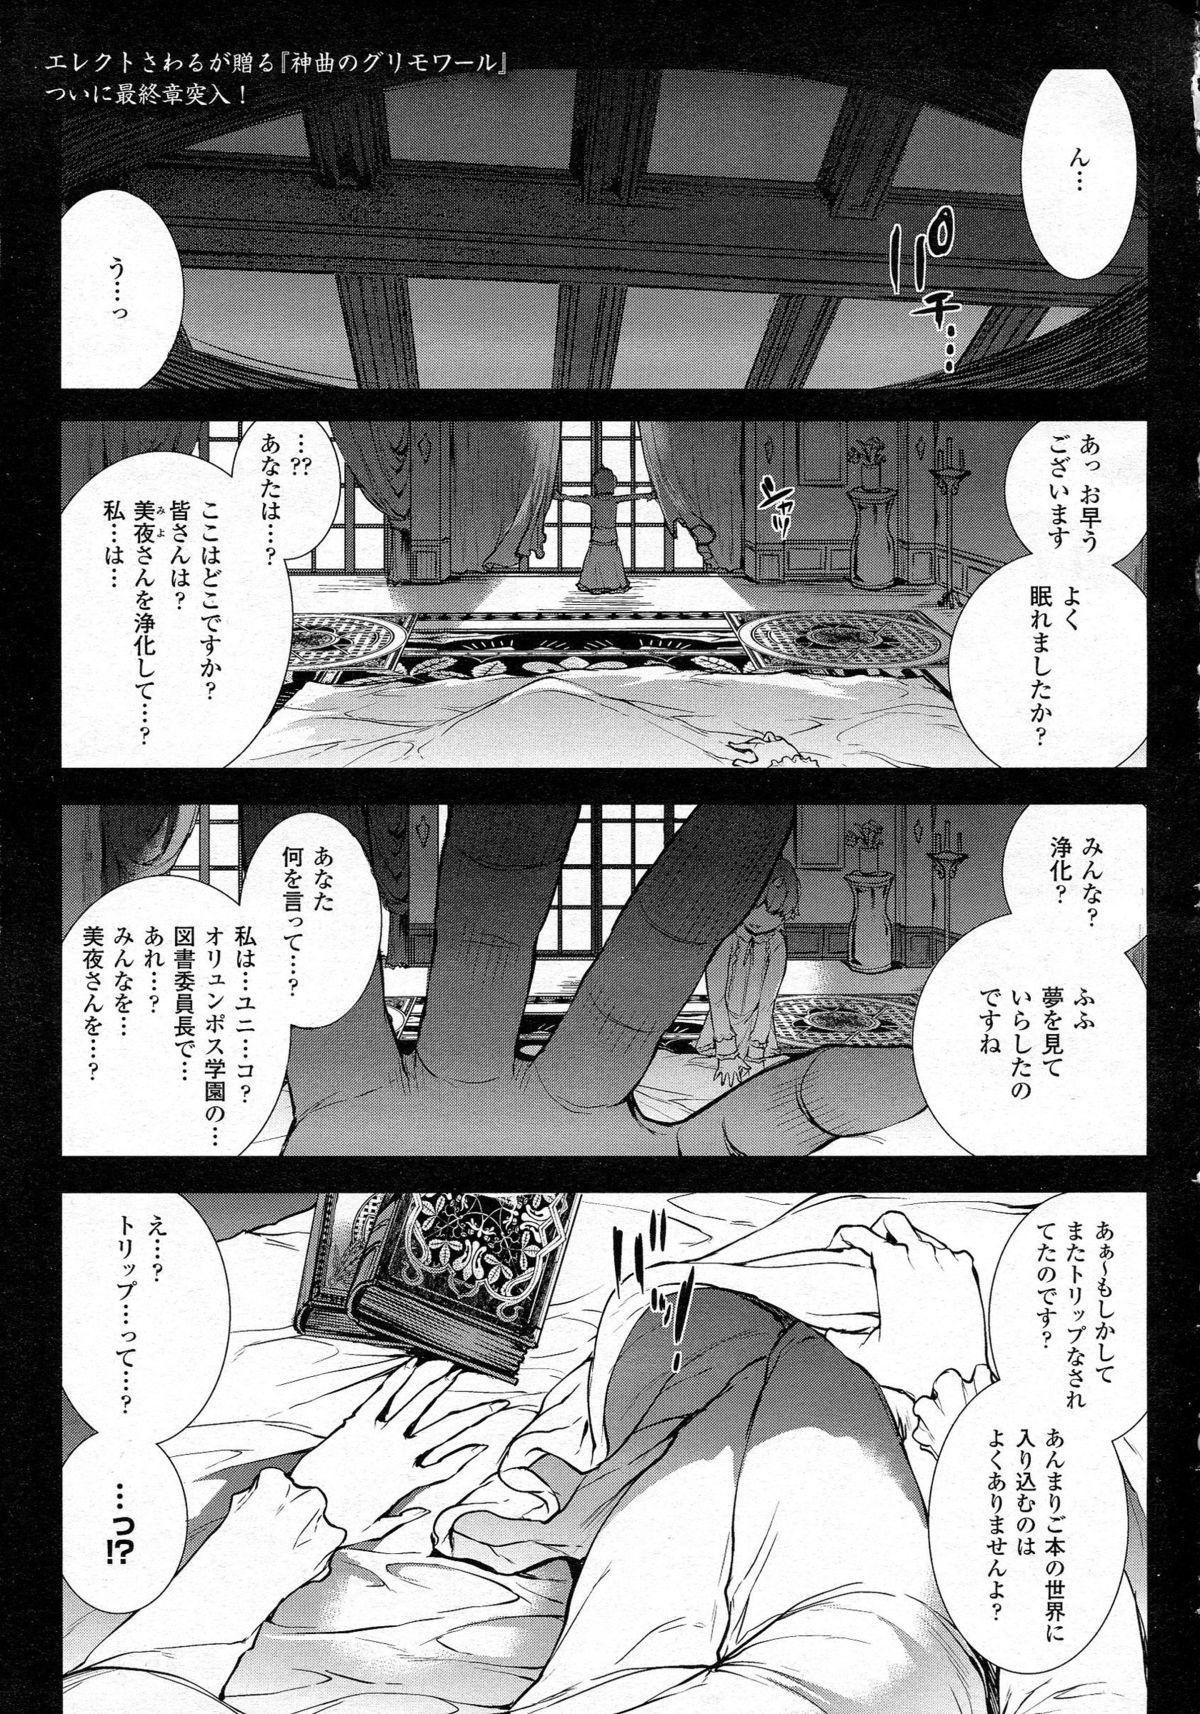 COMIC Unreal 2015-06 Vol. 55 + Hisasi Illust Shuu 39